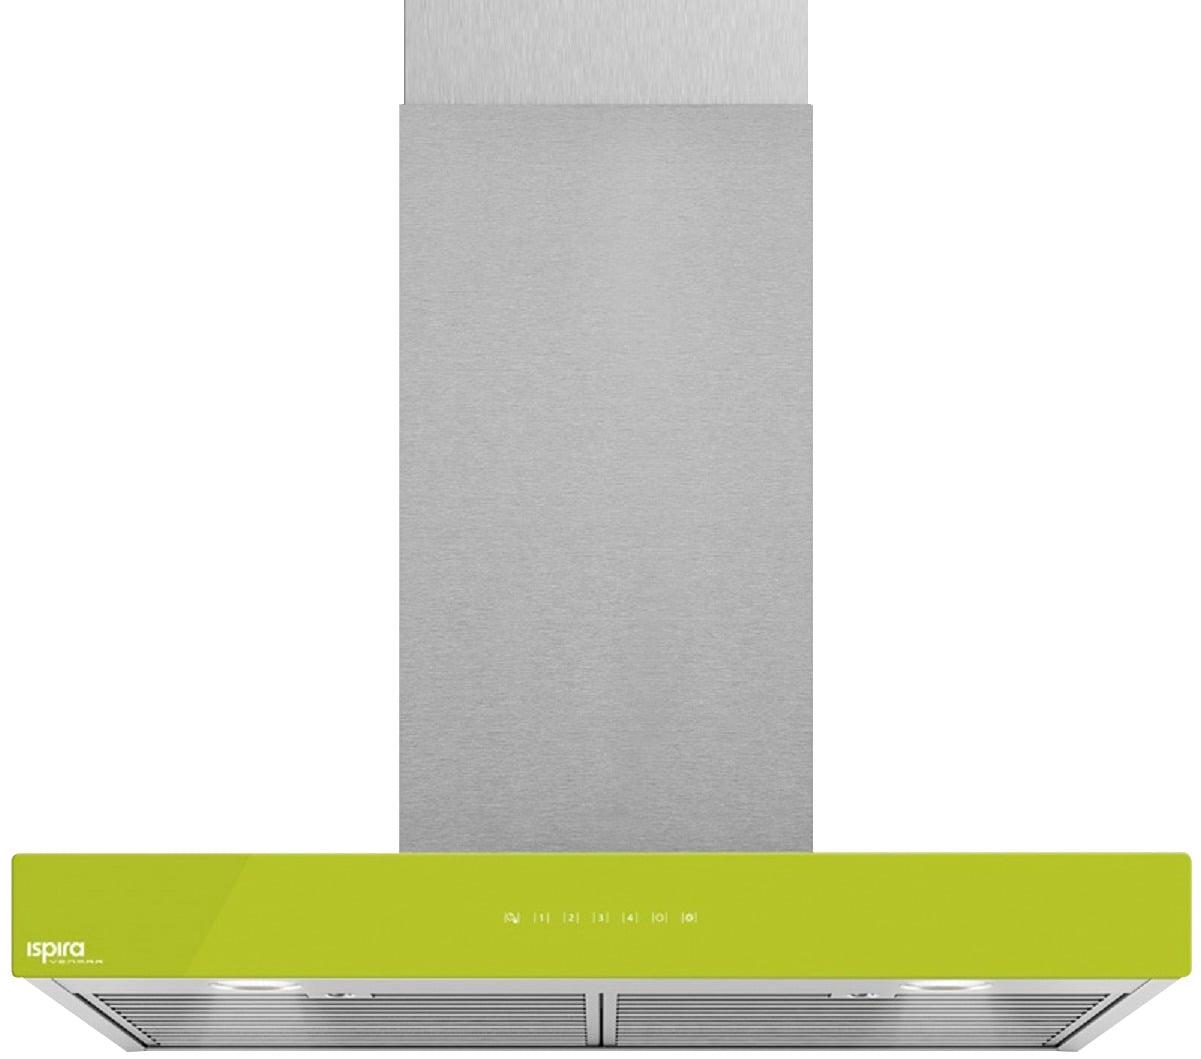 Hotte cheminée Venmar Ispira de 36 po – vert lime